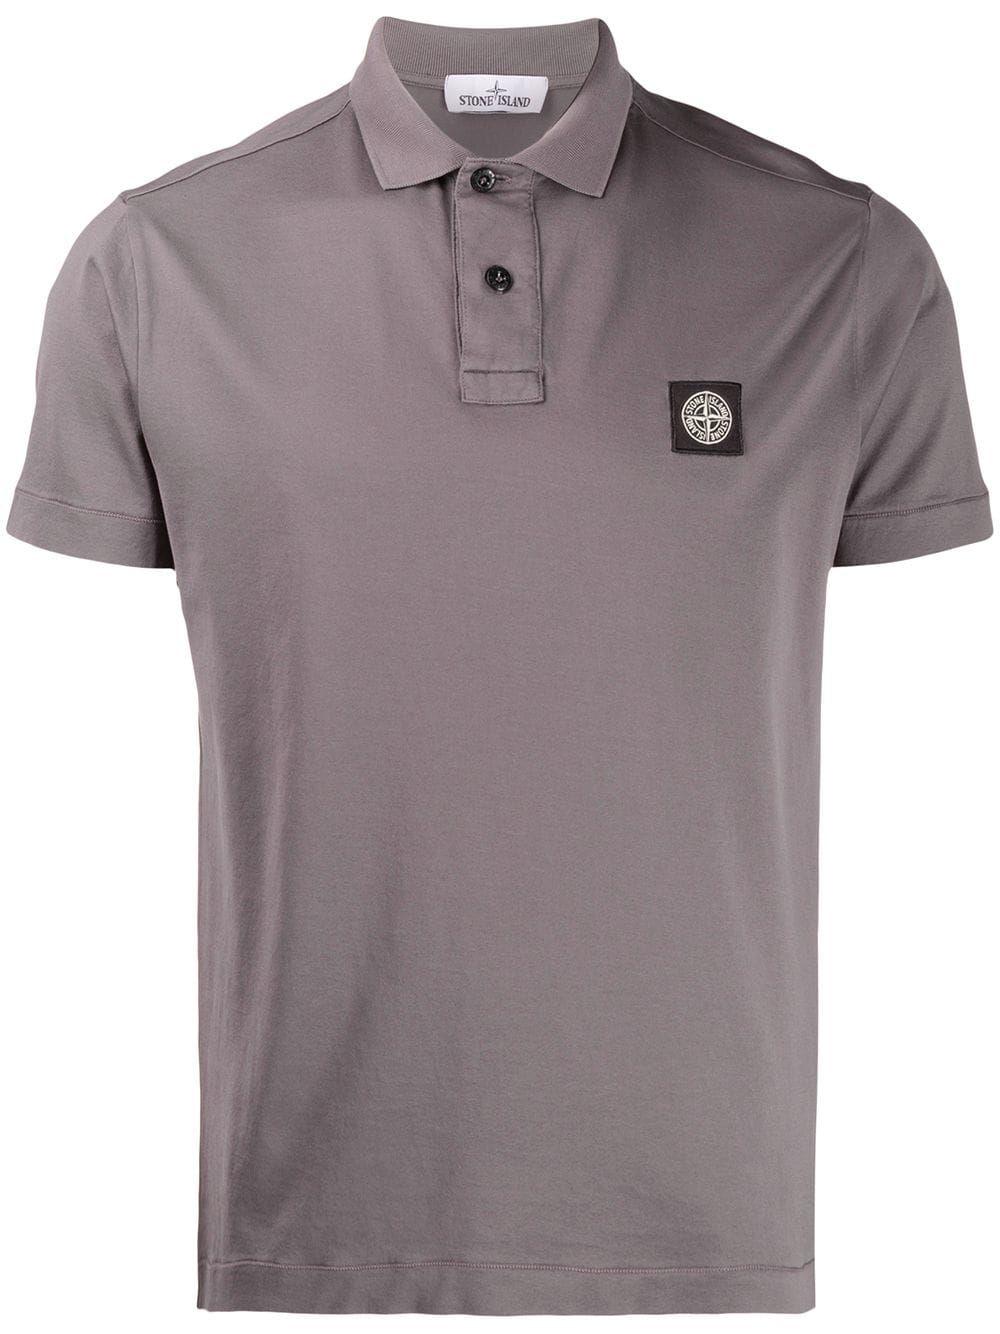 Stone Island Stone Island Embroidered Logo Polo T Shirt Grey Stoneisland Cloth Polo T Shirts Stone Island Shirts Grey